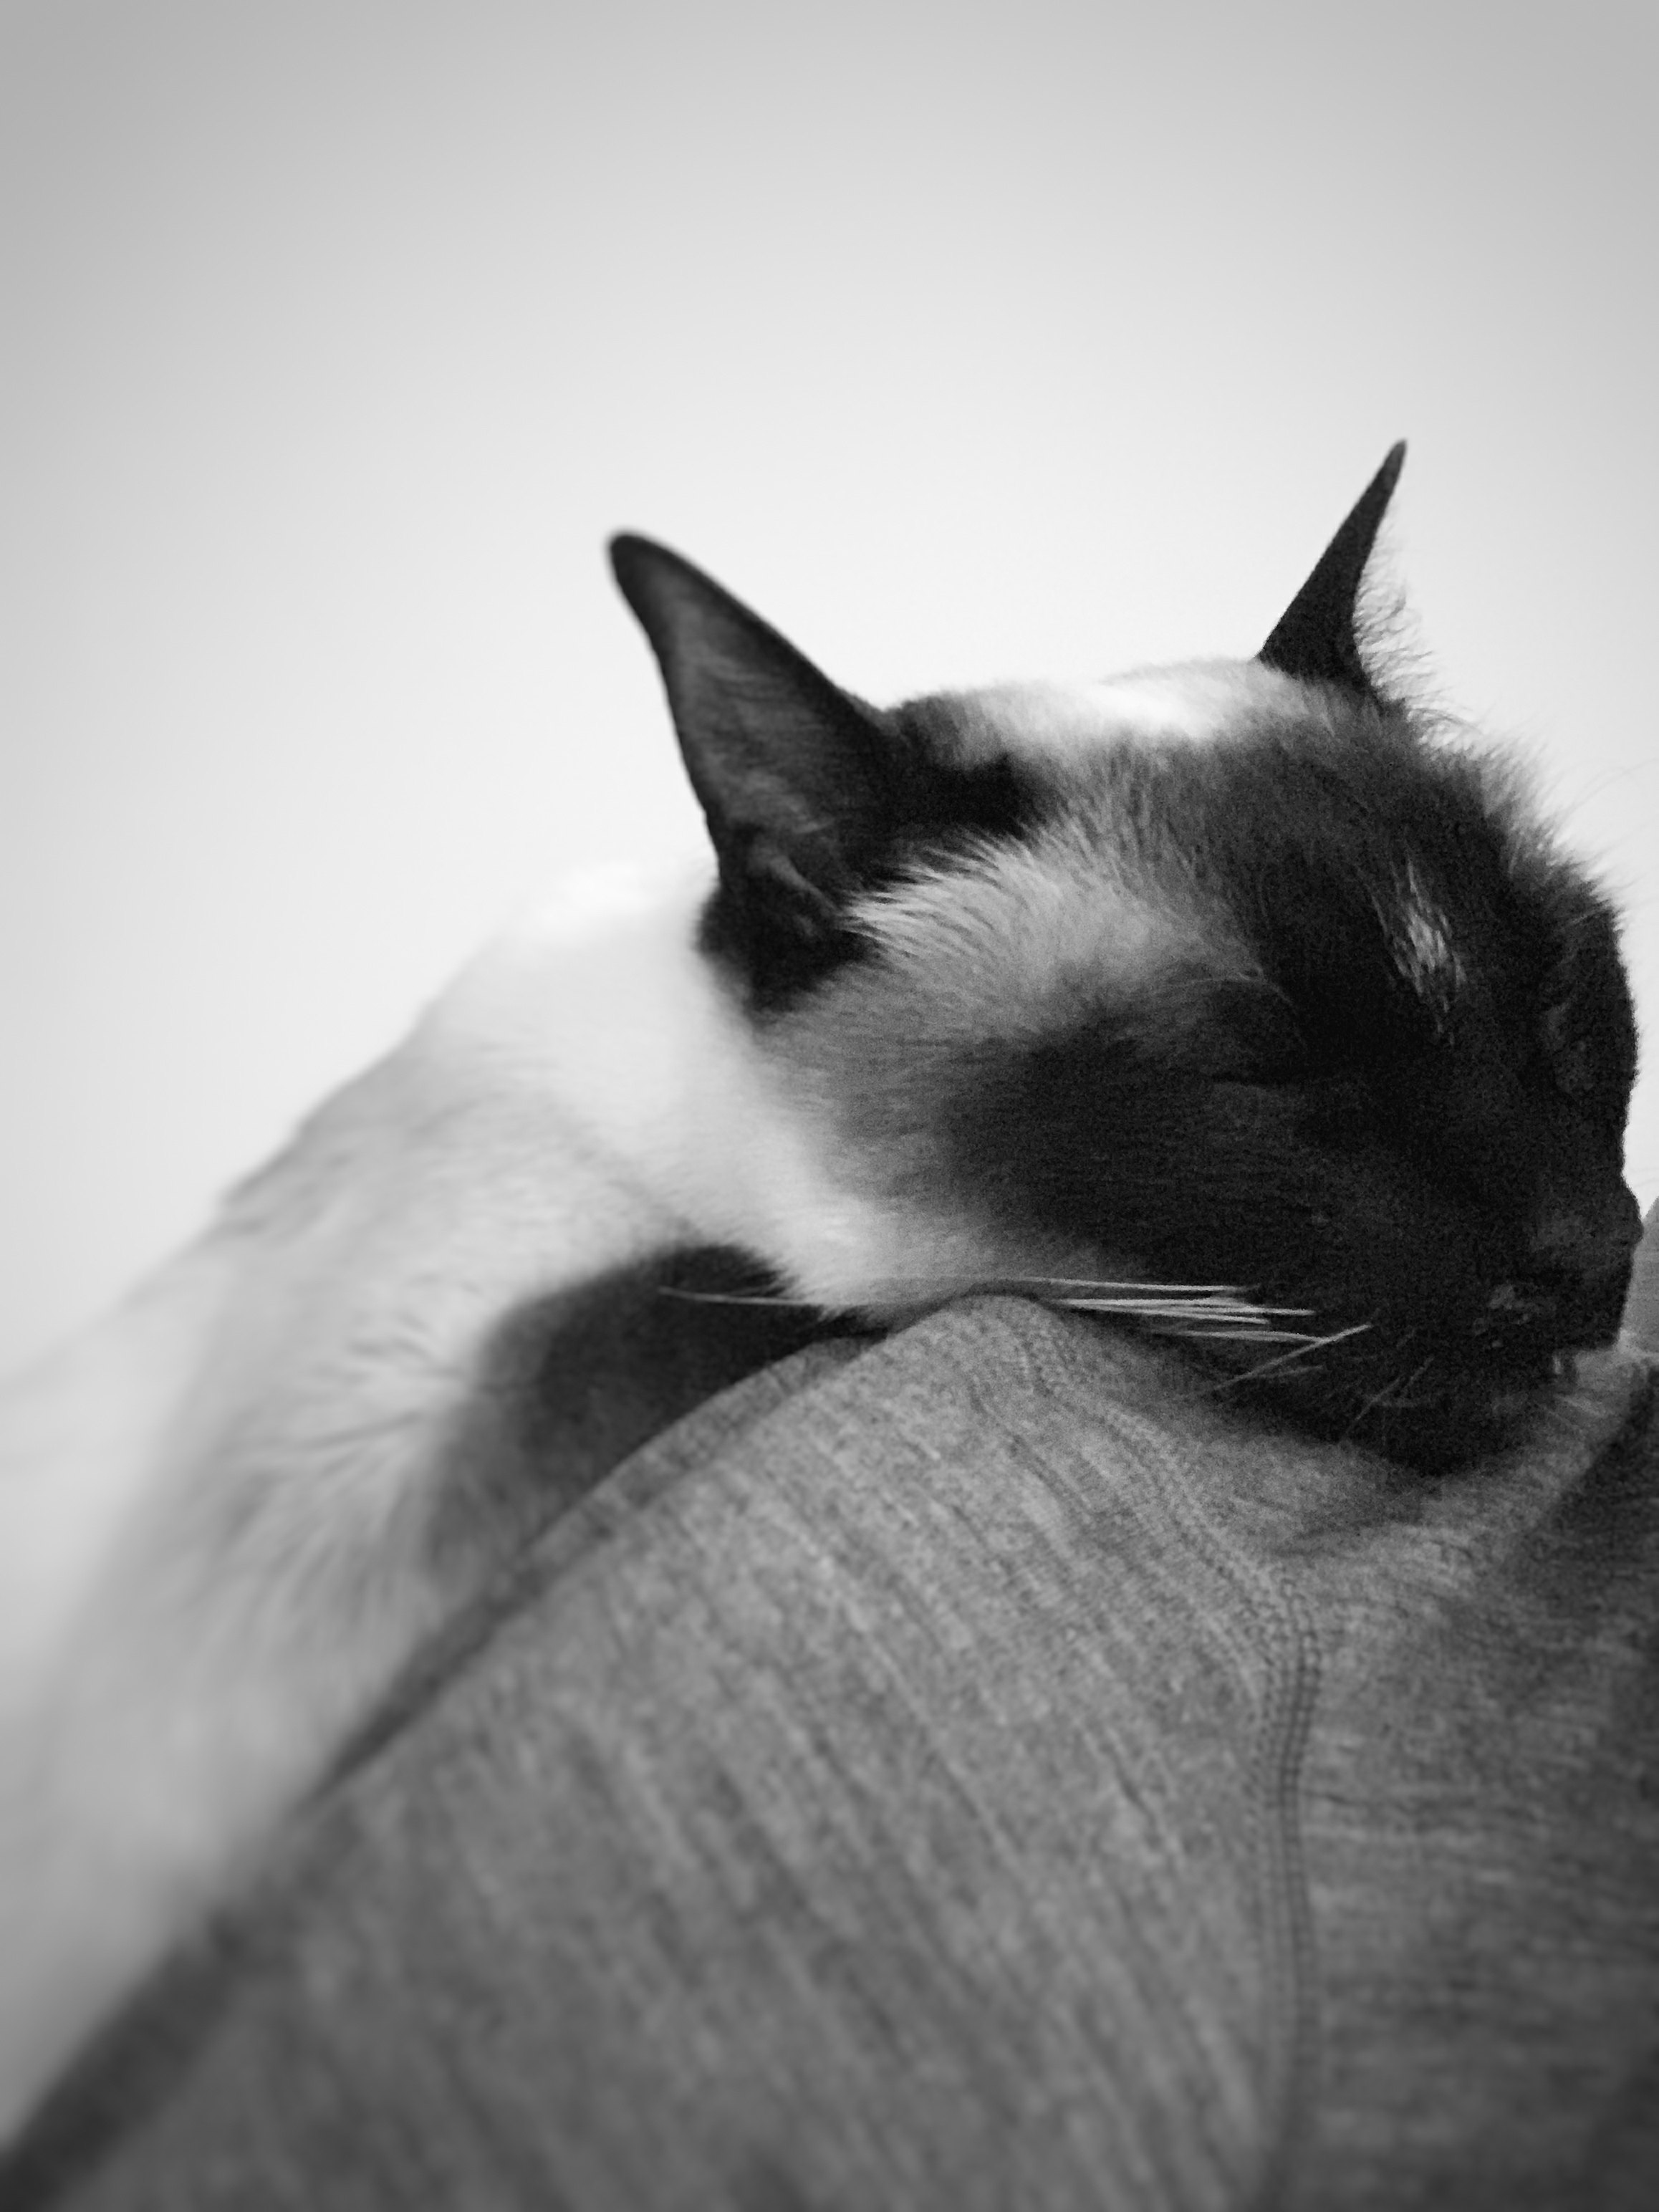 alchemist-eating-siamese-cat-sleeping.jpg